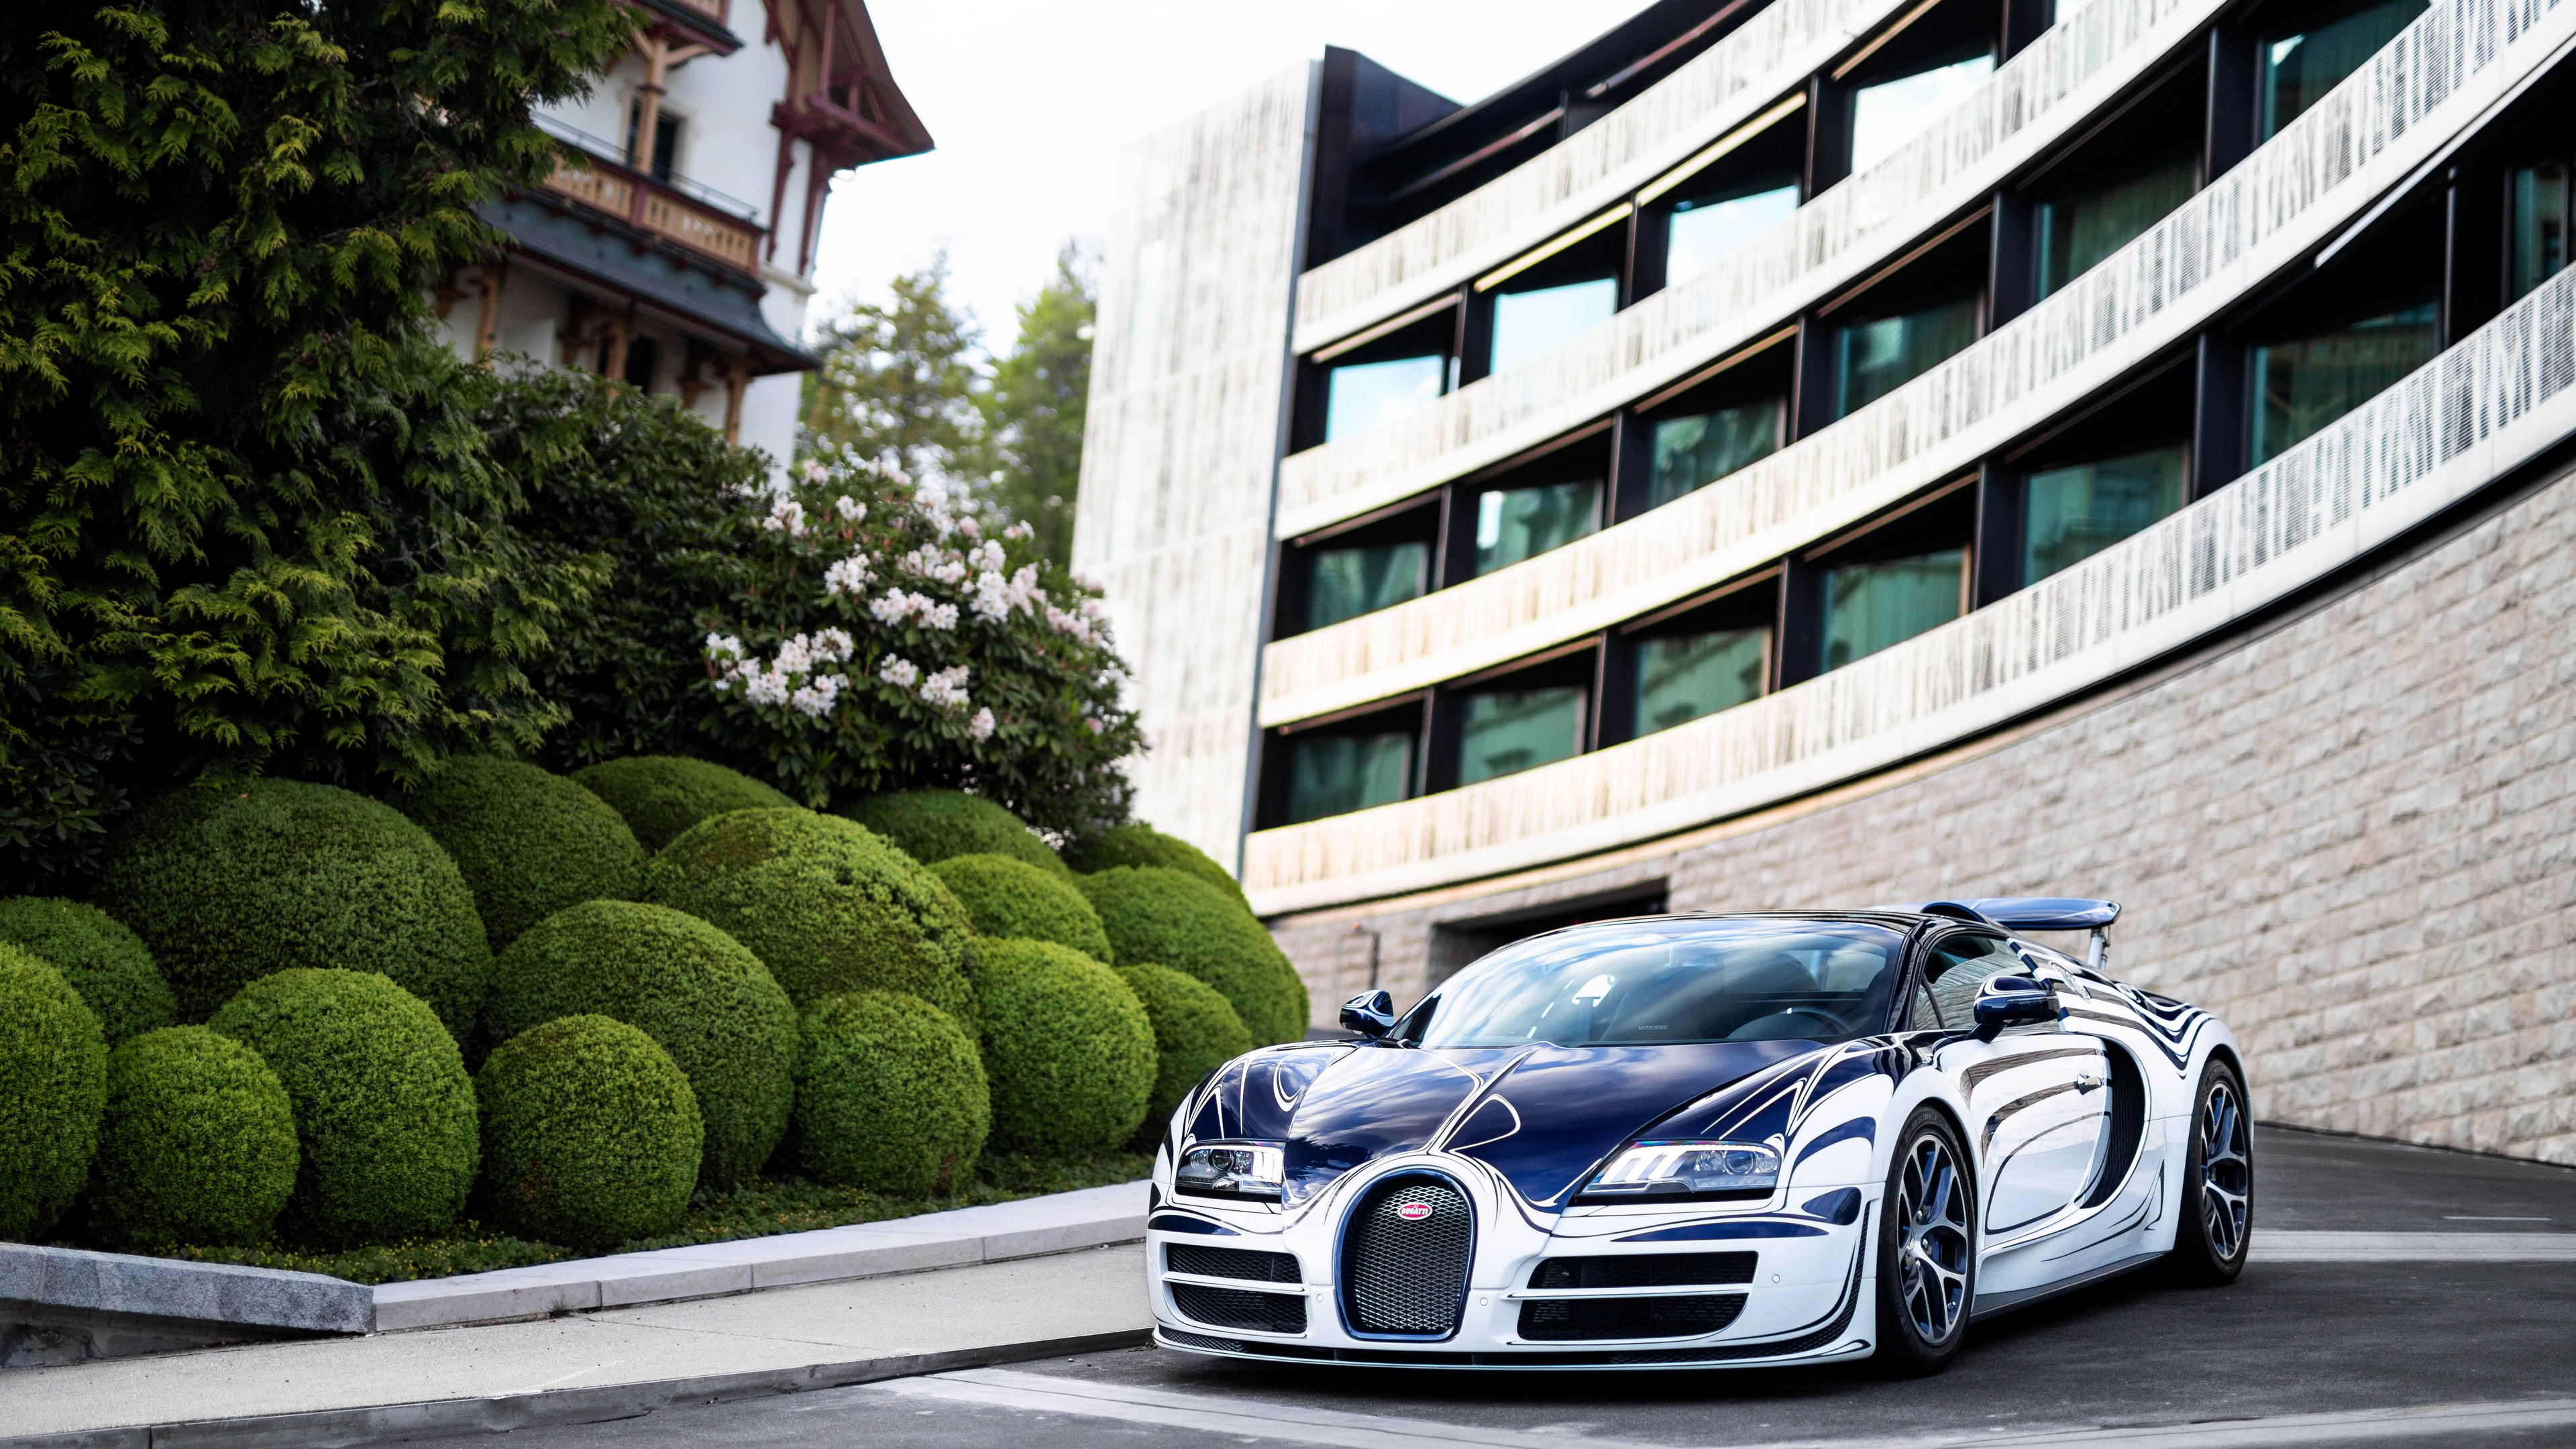 Bugatti Veyron Grand Sport Roadster 4k 2886164 Hd Wallpaper Backgrounds Download